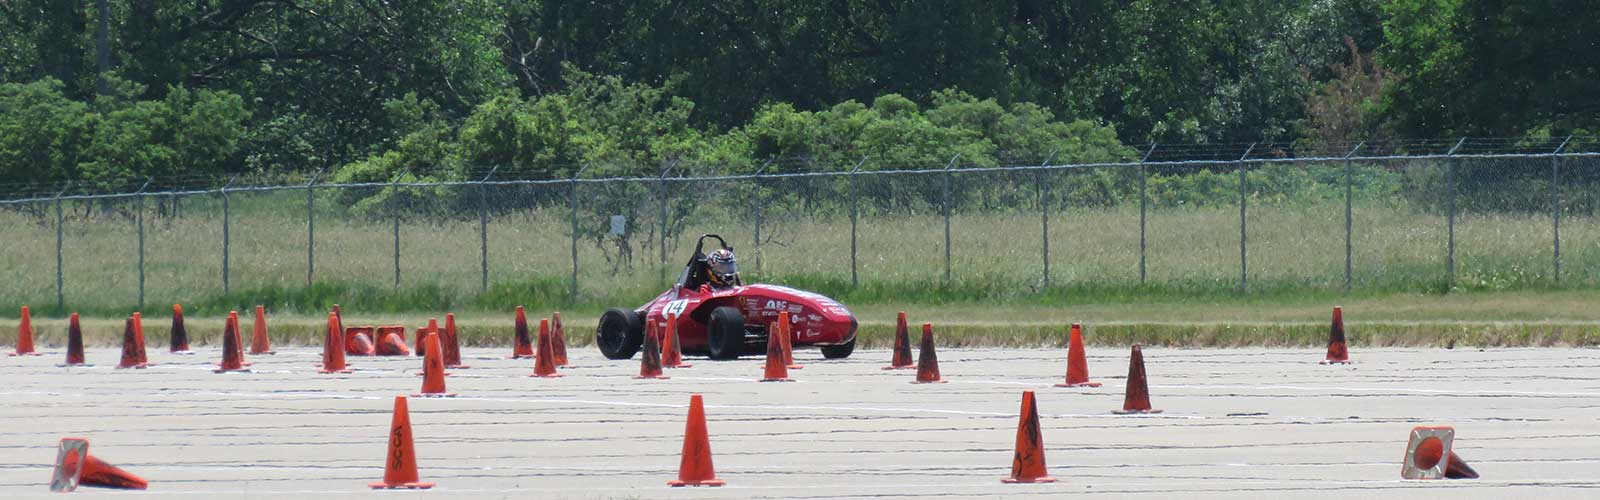 Husker Motorsports teams wrap up impressive seasons